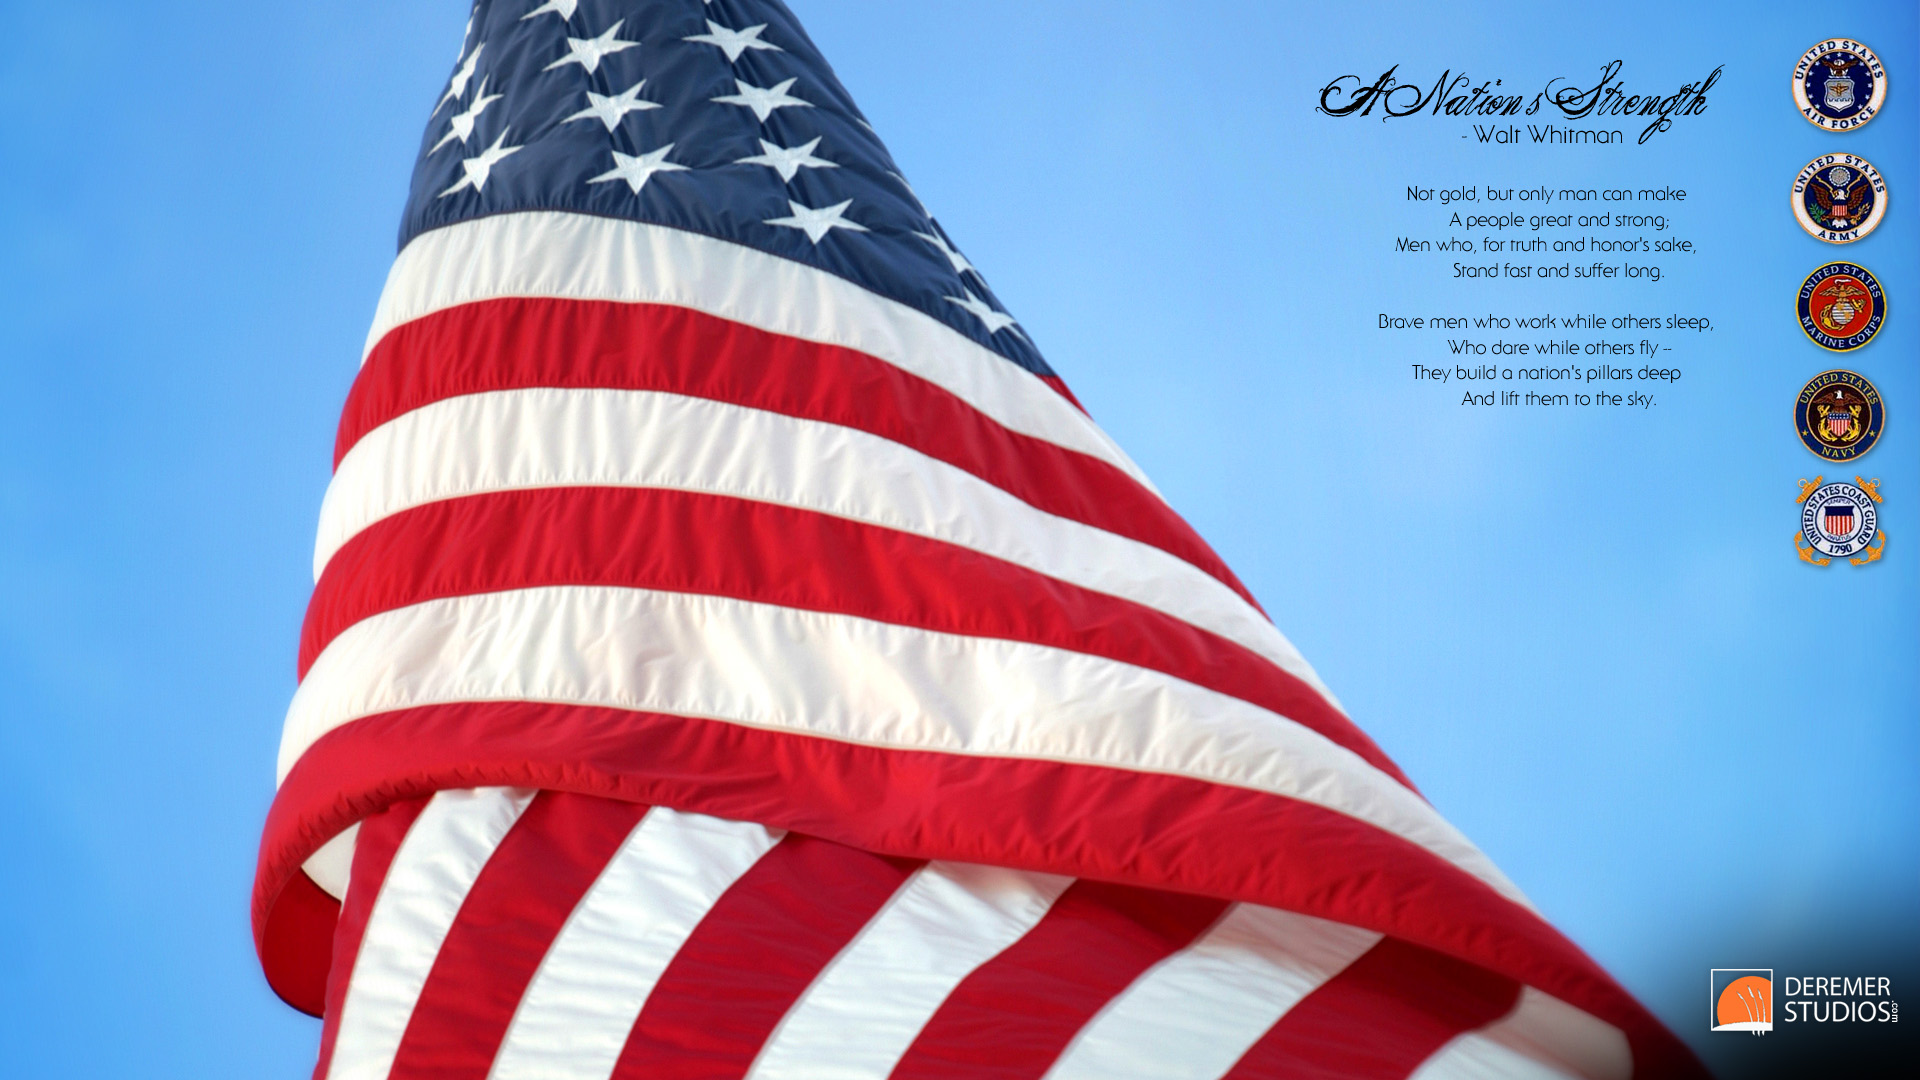 Veterans Day Hd Wallpaper